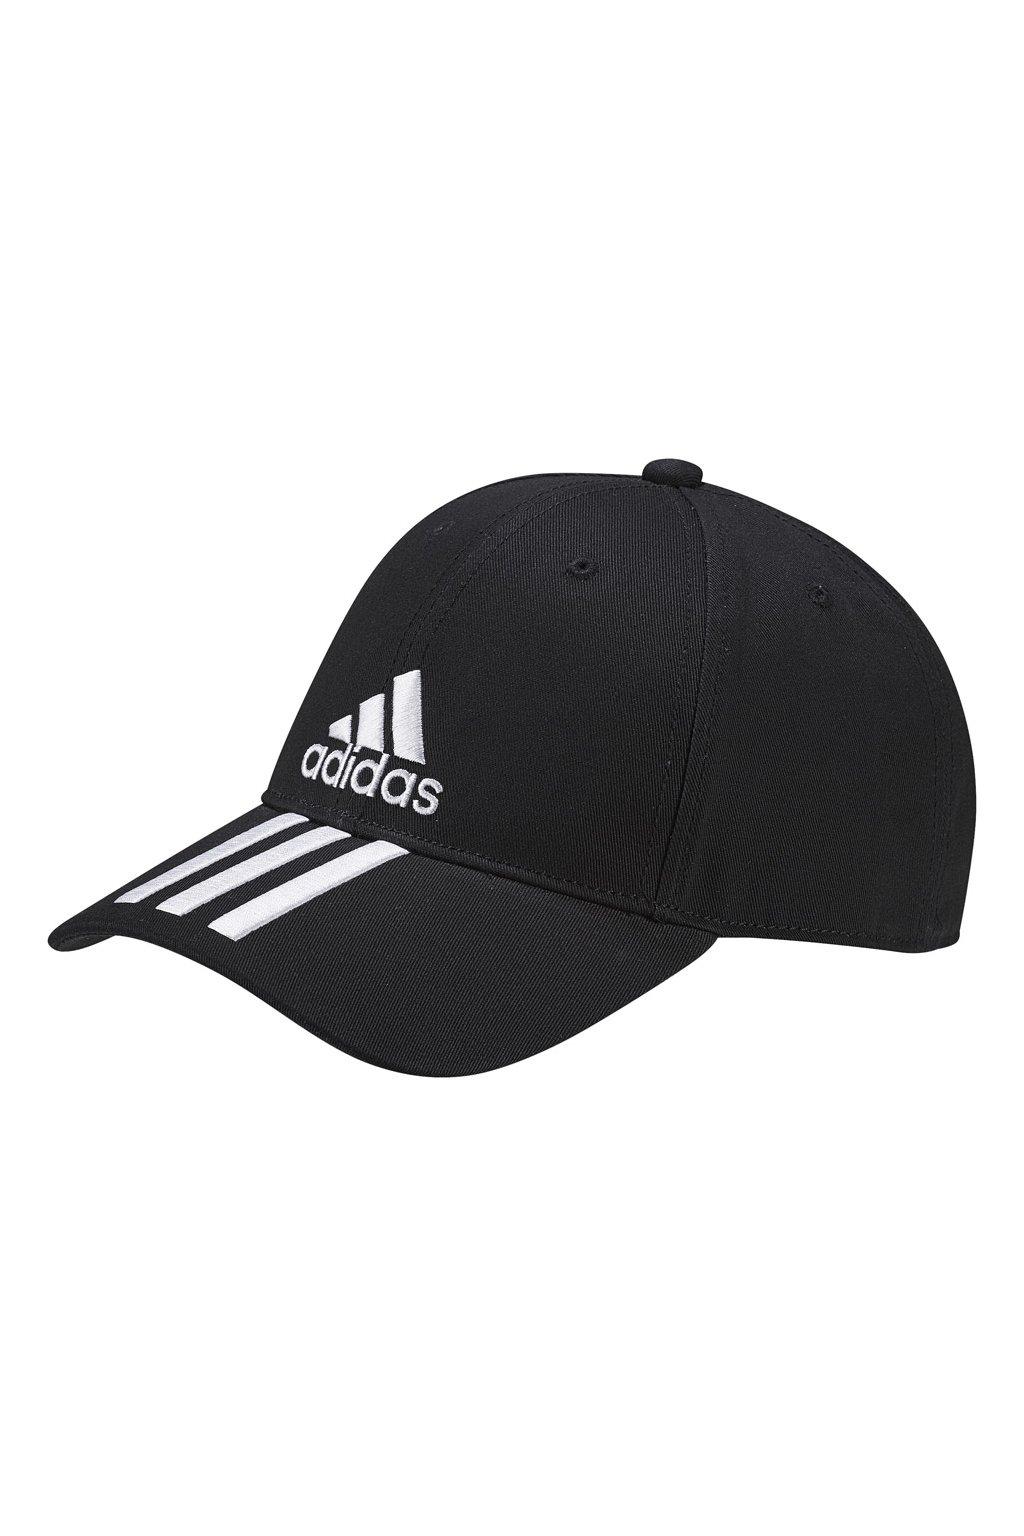 Adidas juniorská šiltovka čierna DU0196